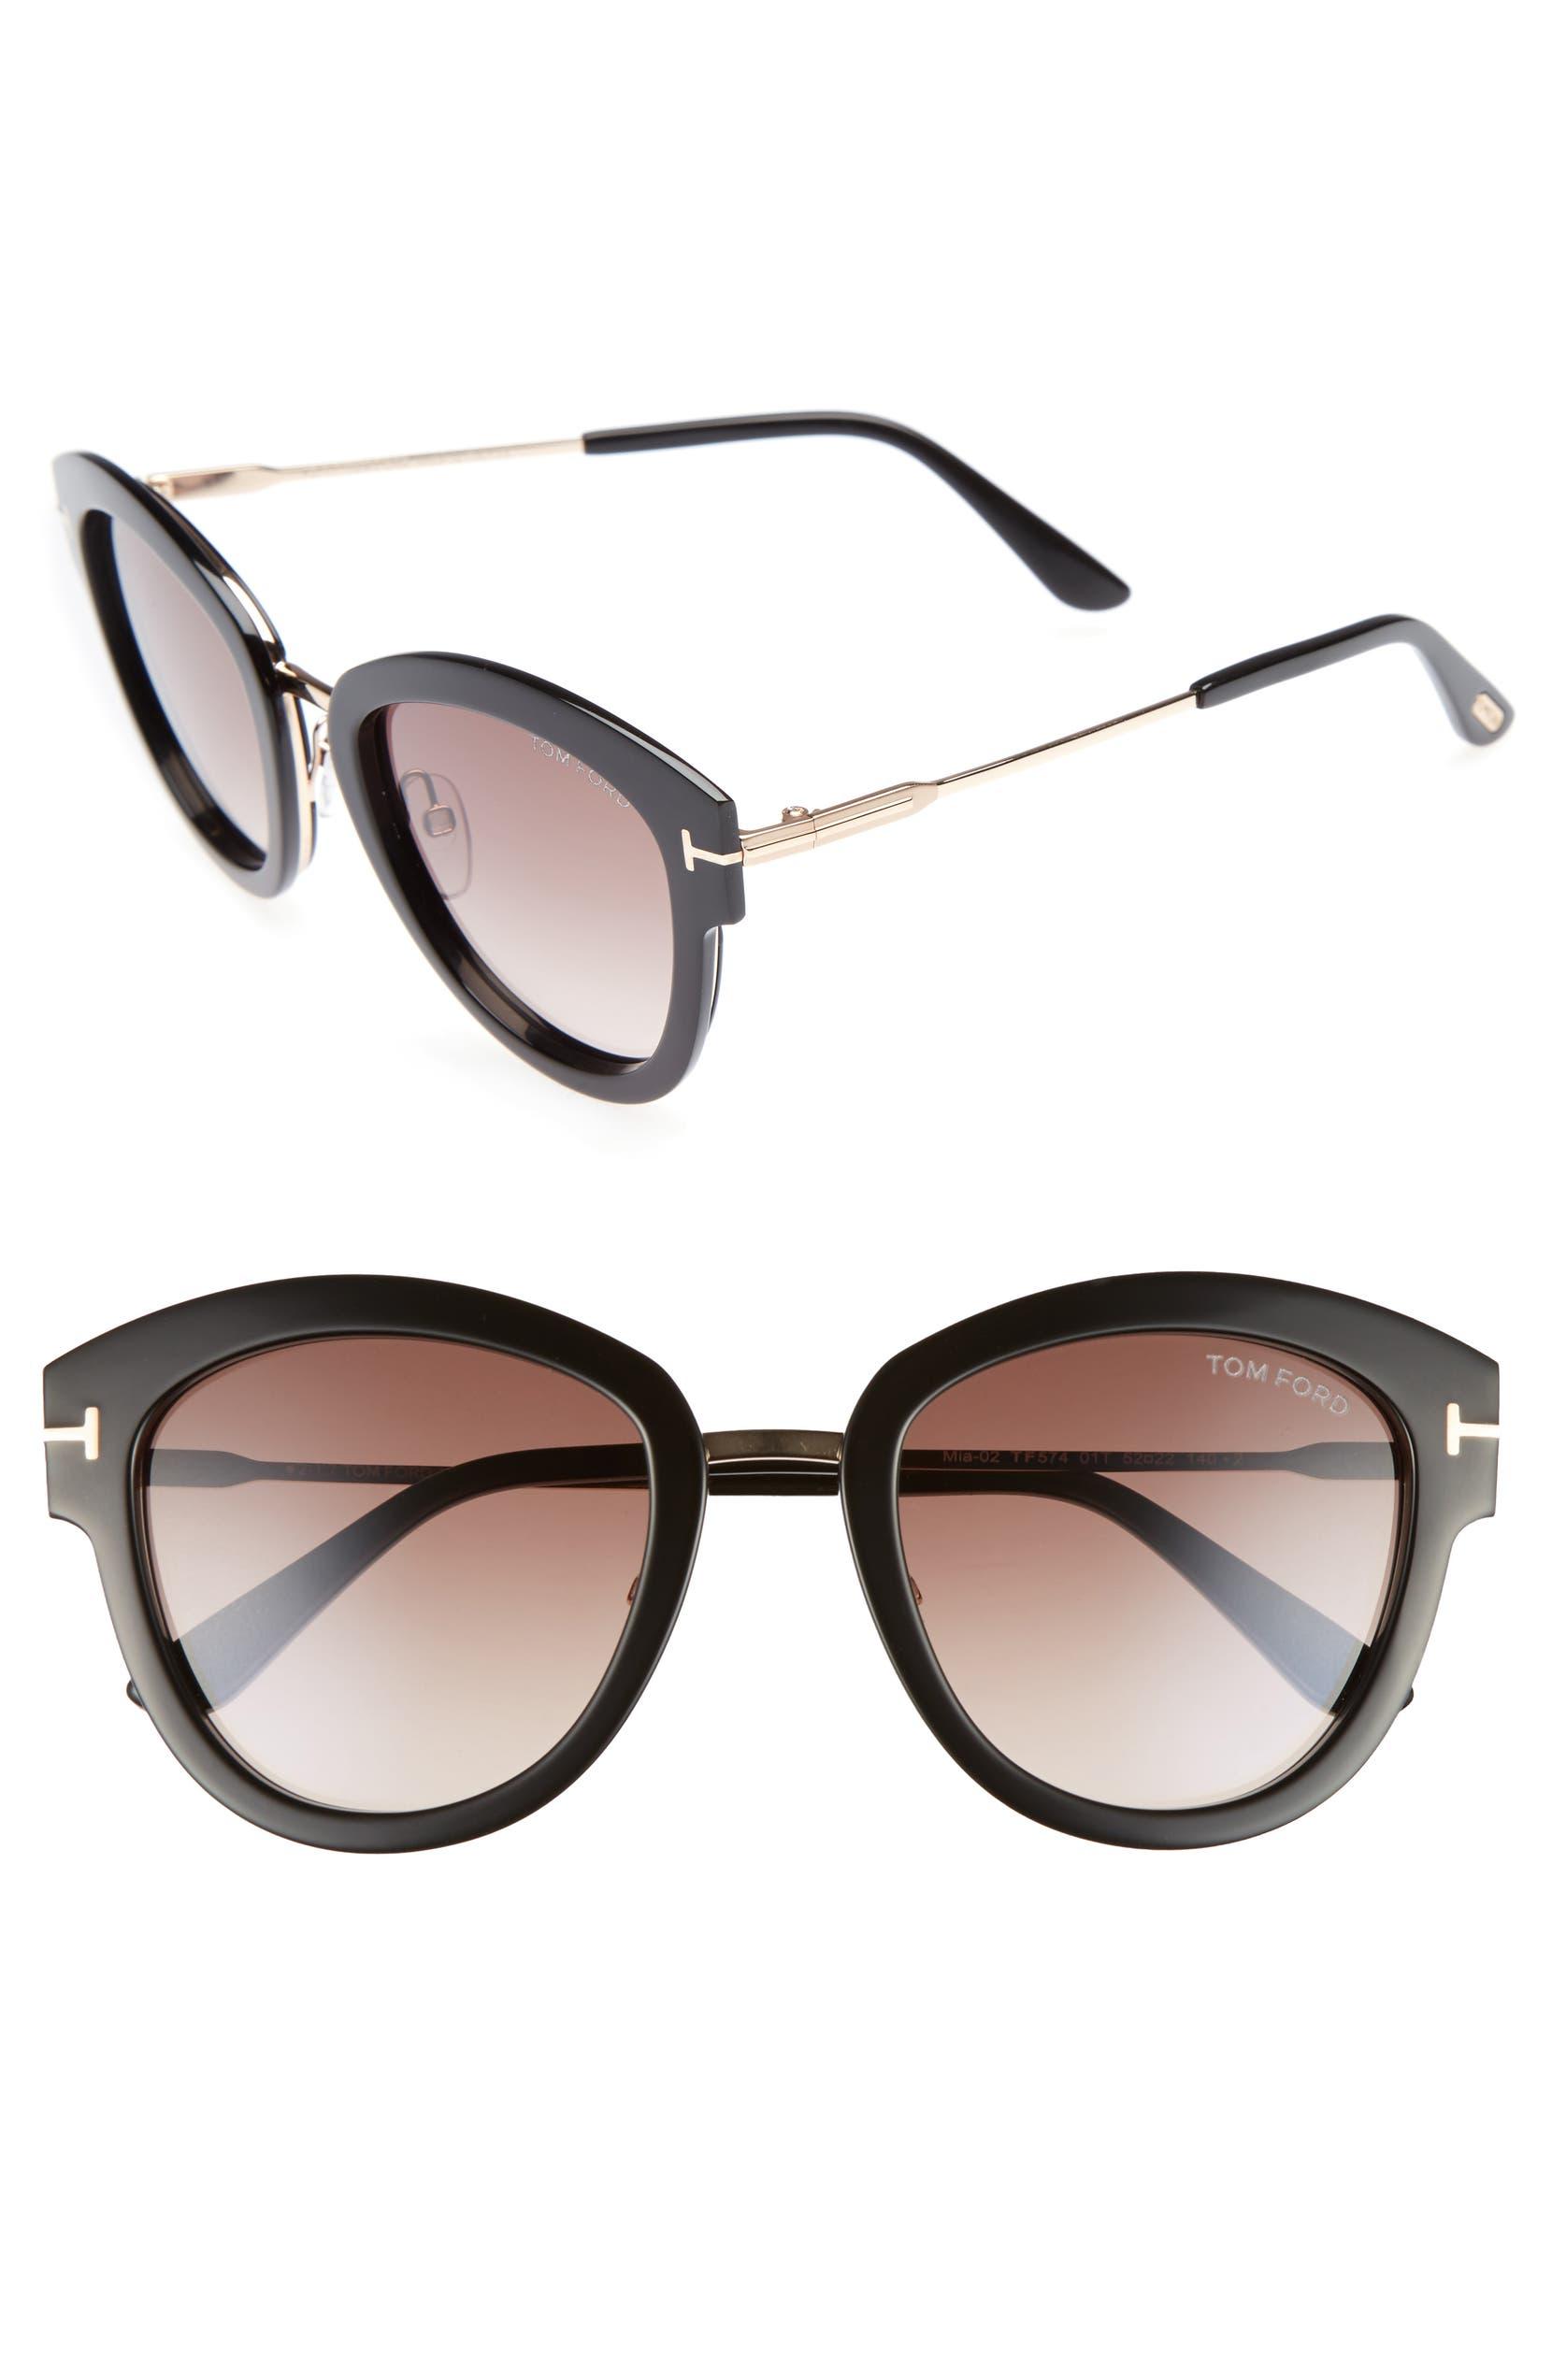 b13332458731d Tom Ford Mia 55mm Cat Eye Sunglasses